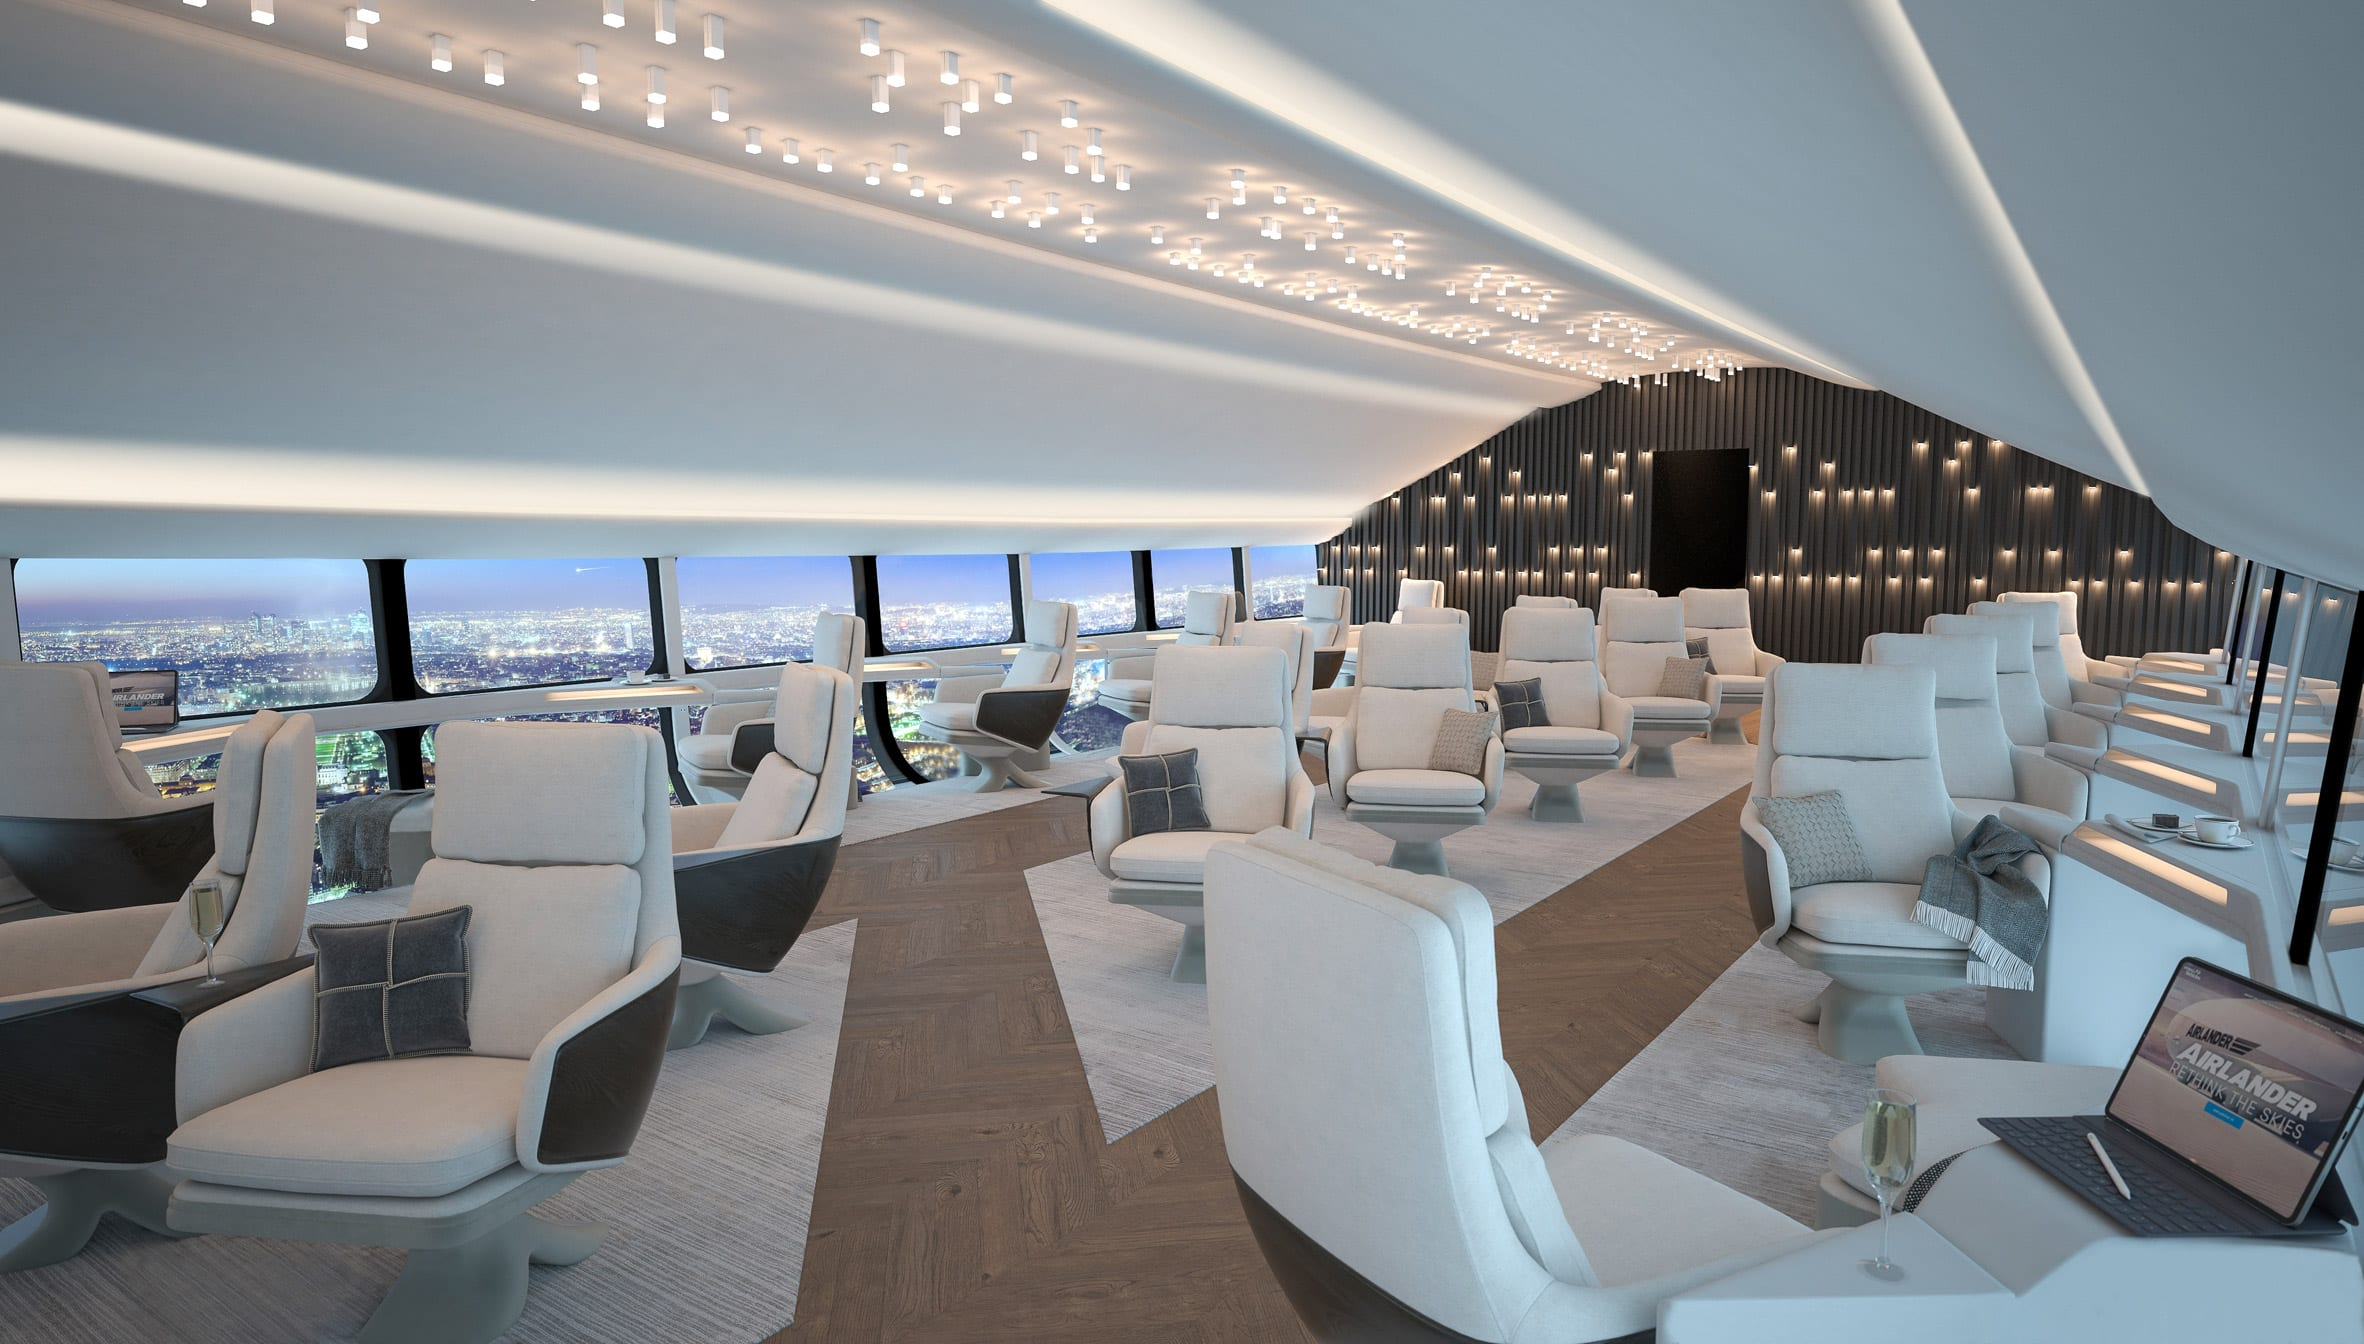 Interior render of the Airlander 10